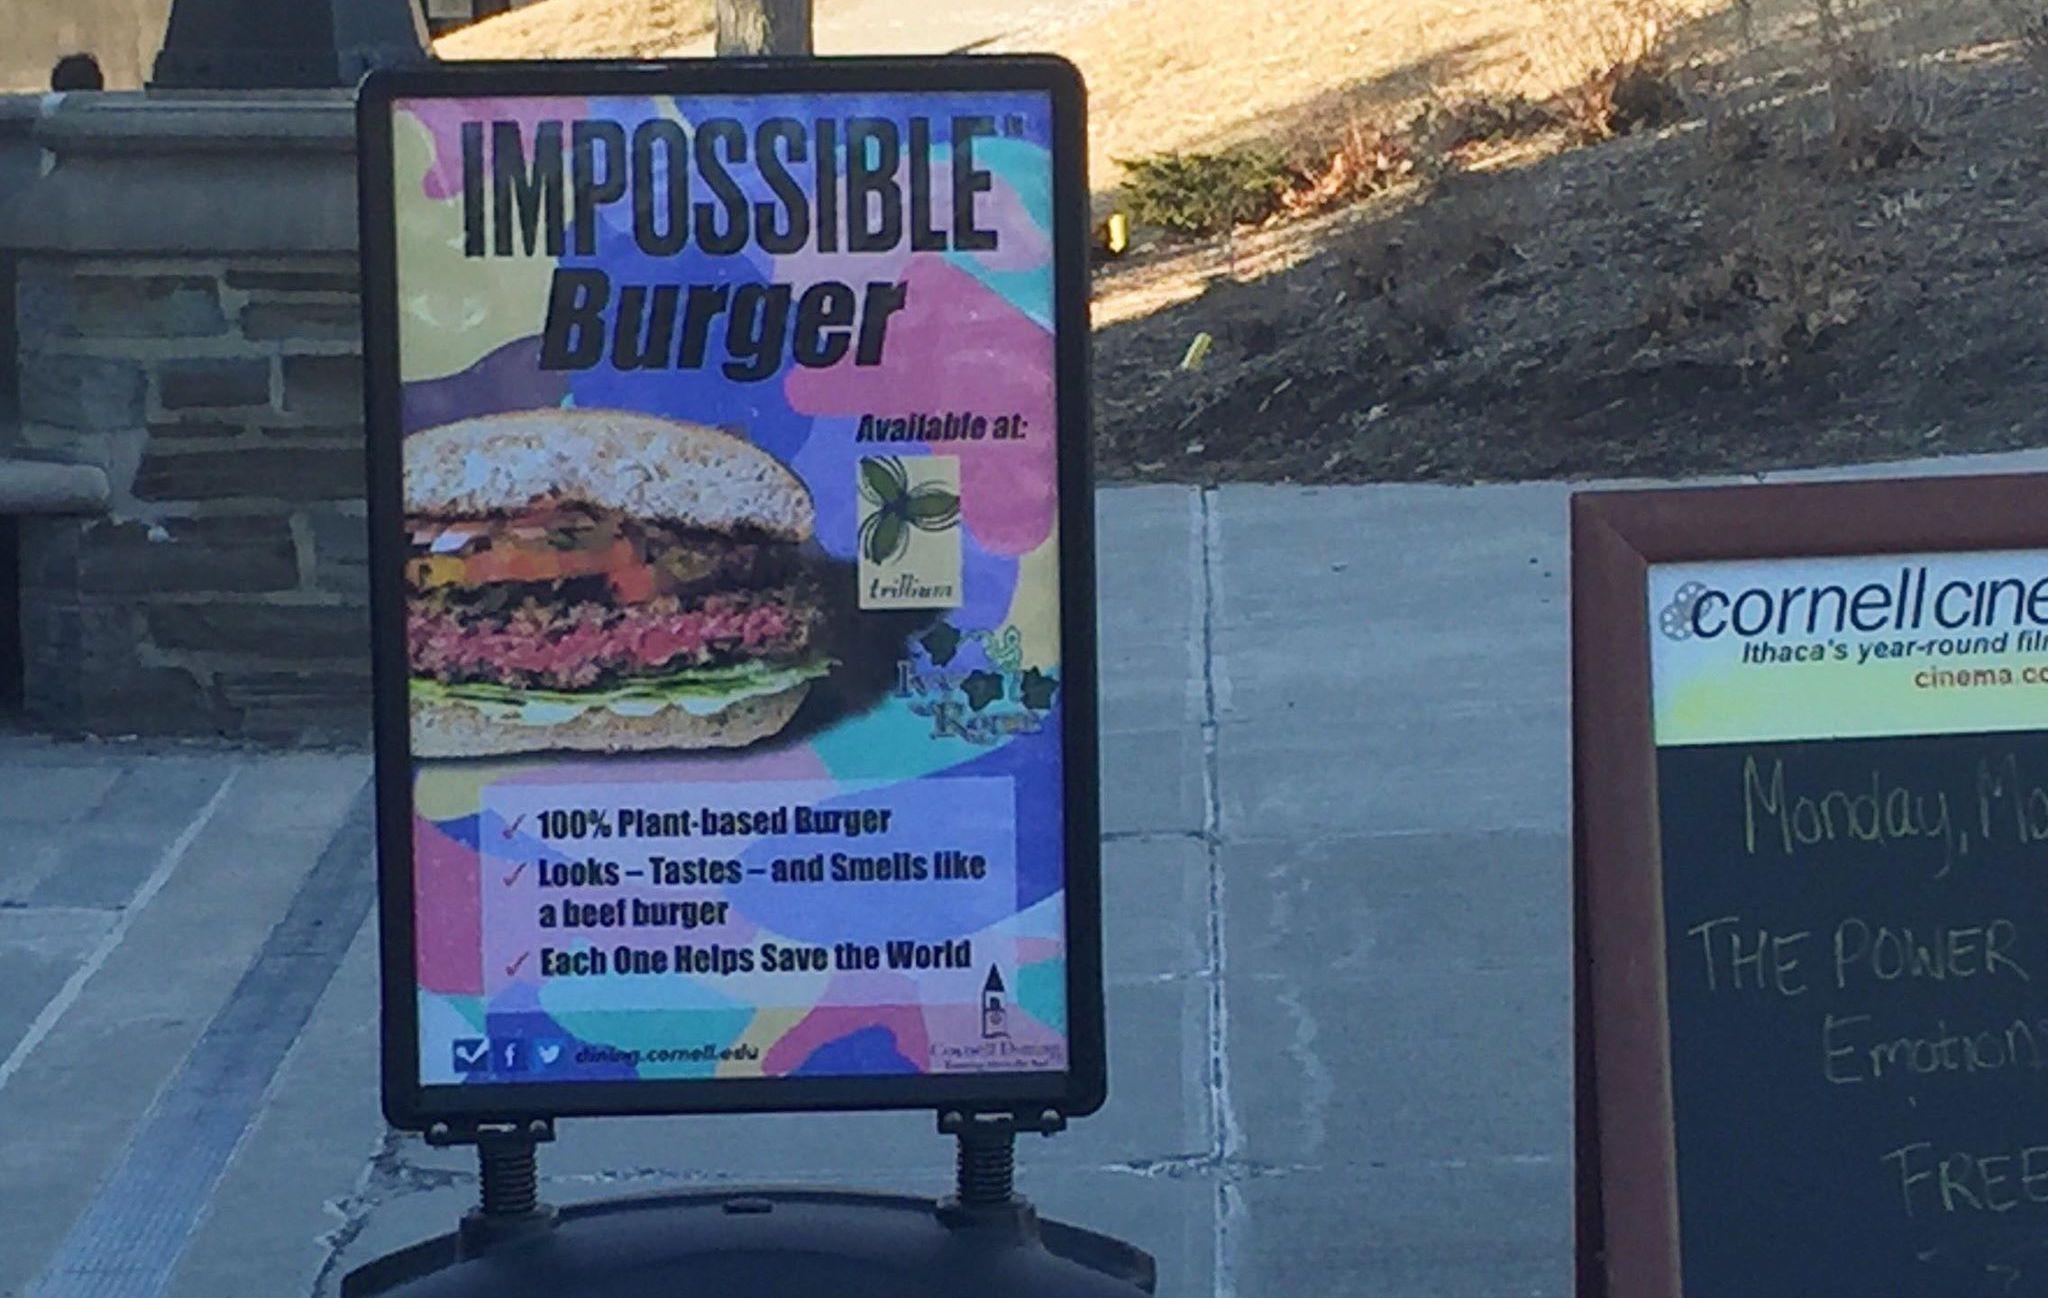 Impossible! This Average Veggie Burger Costs 10.99